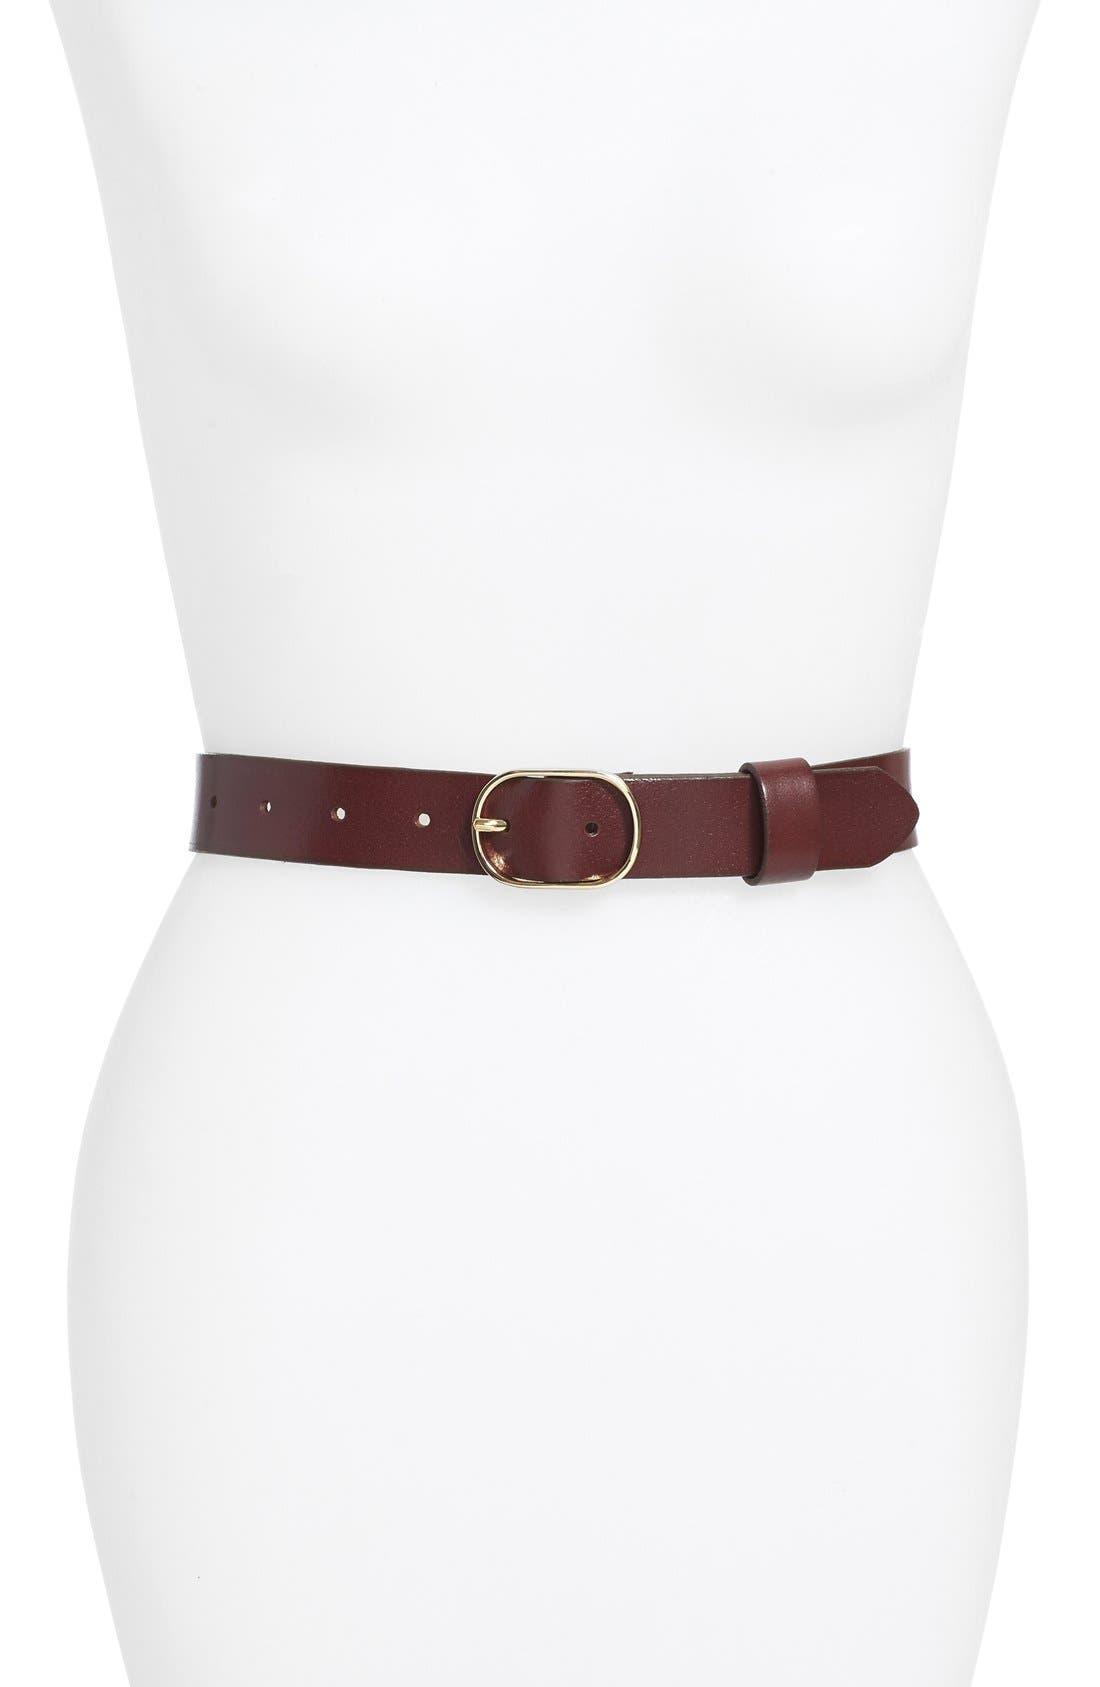 Tailored Trouser Leather Belt,                             Main thumbnail 1, color,                             BURGUNDY STEM